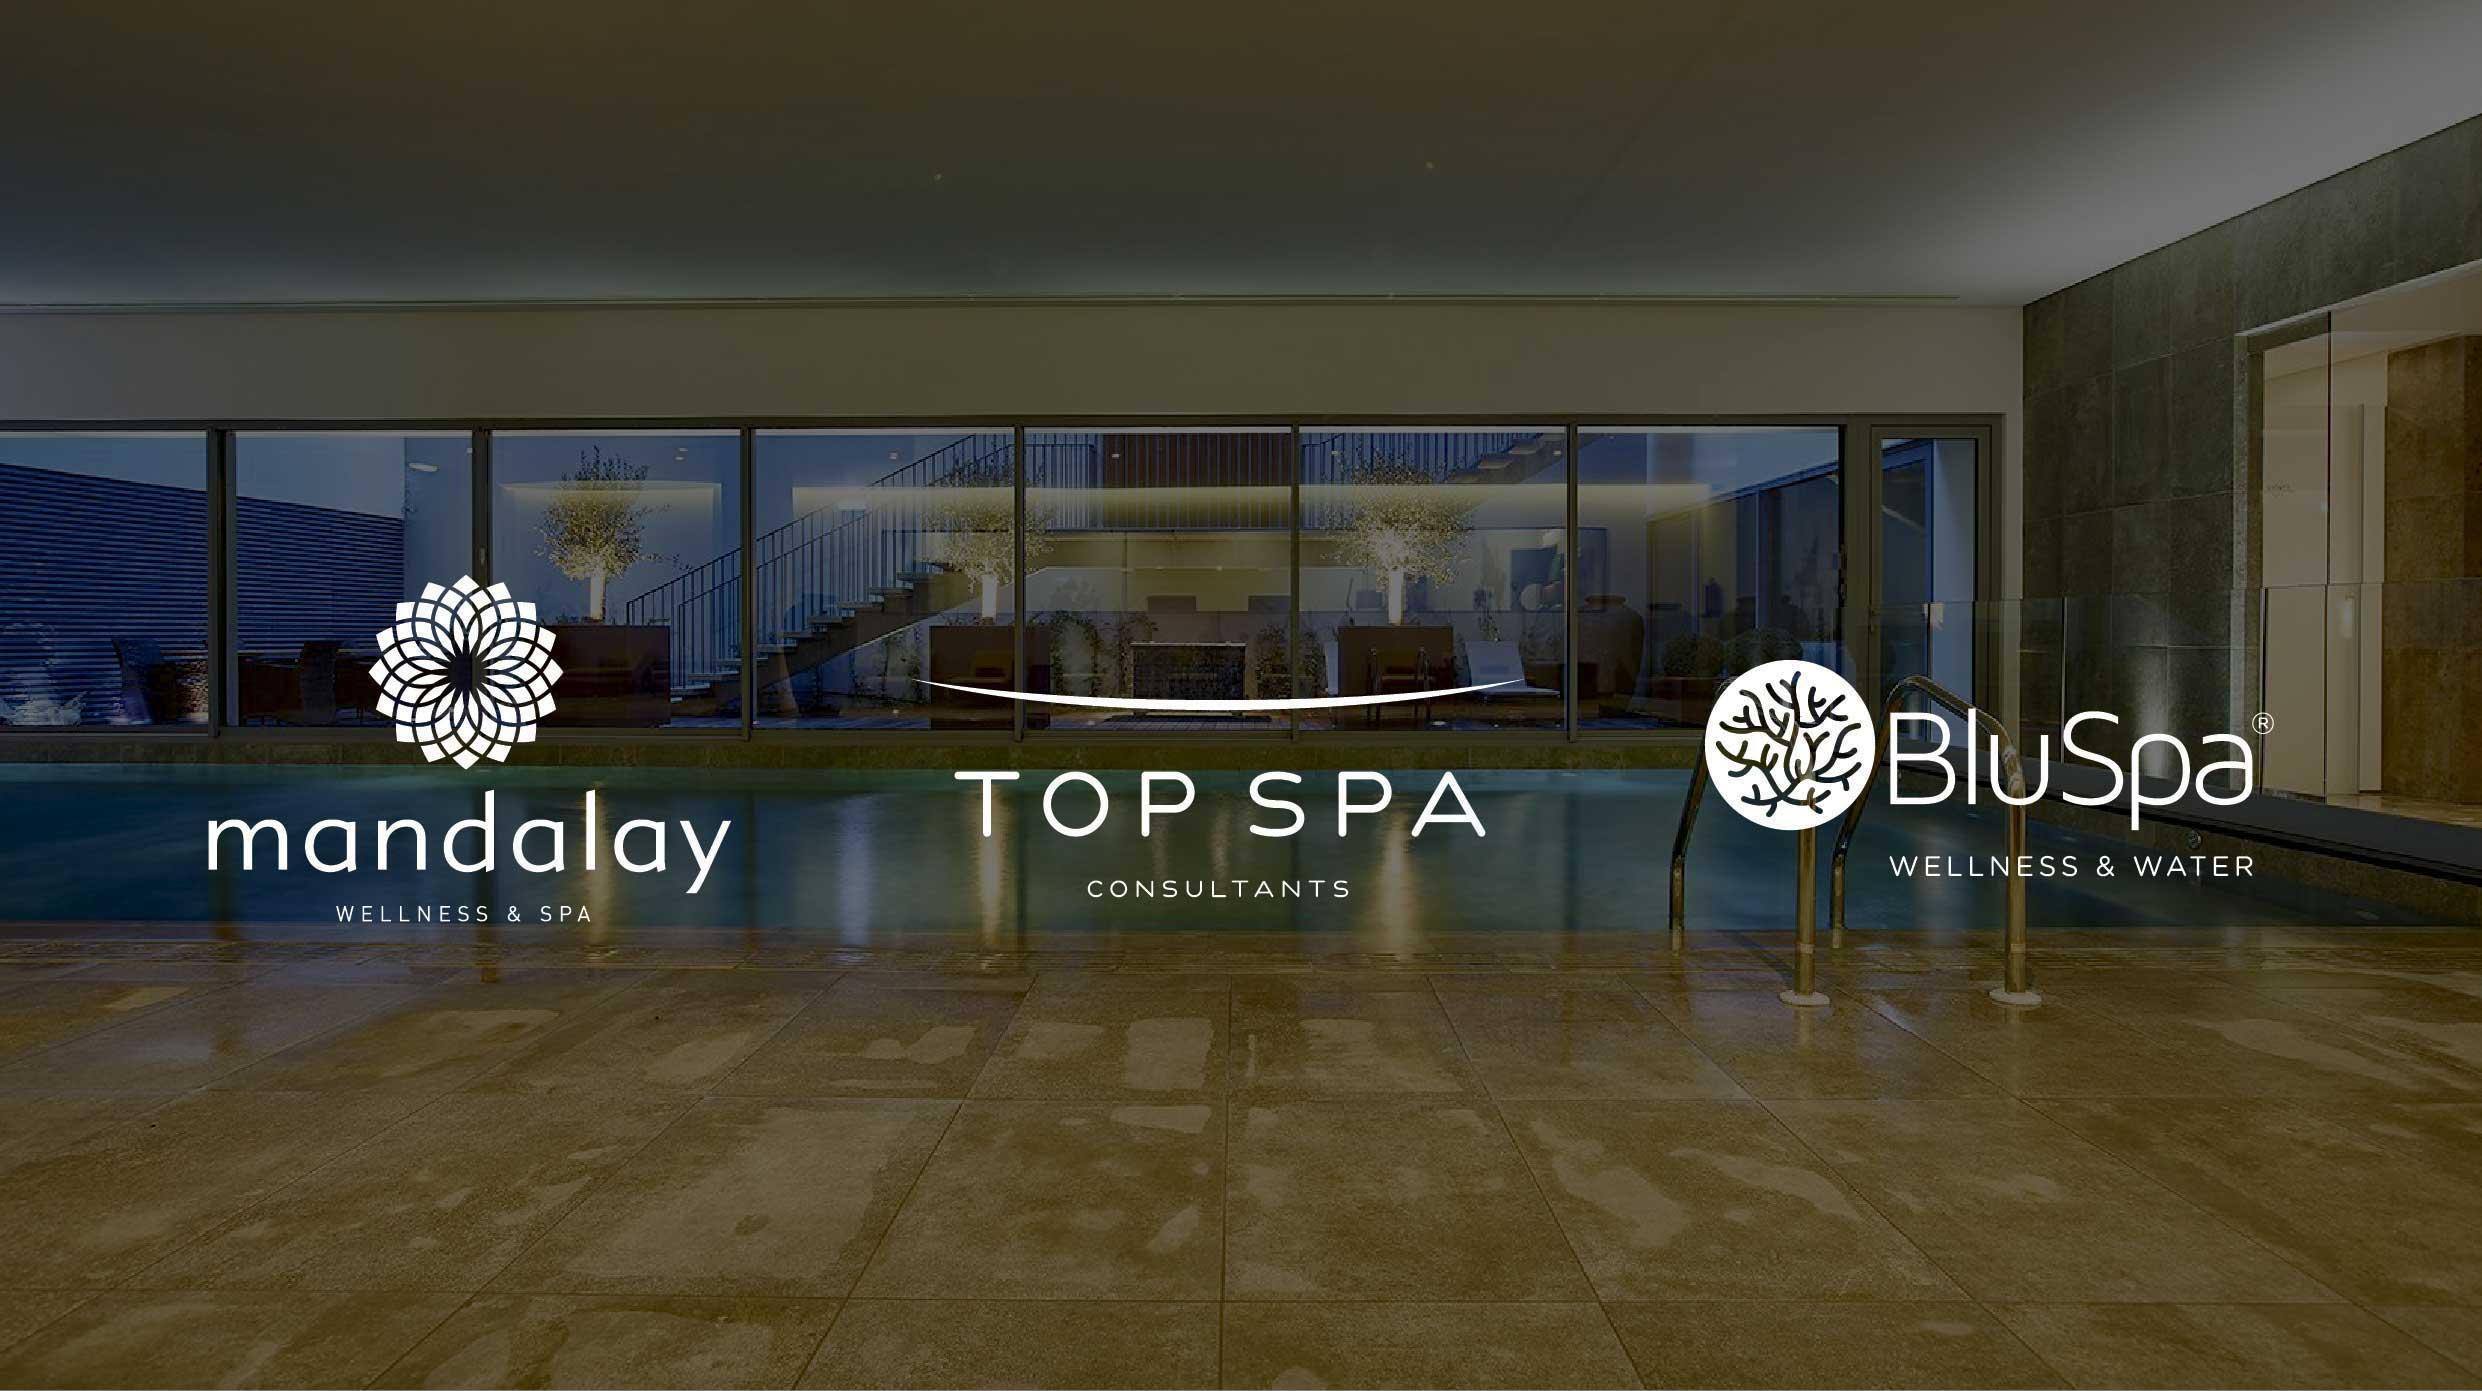 Top Spa